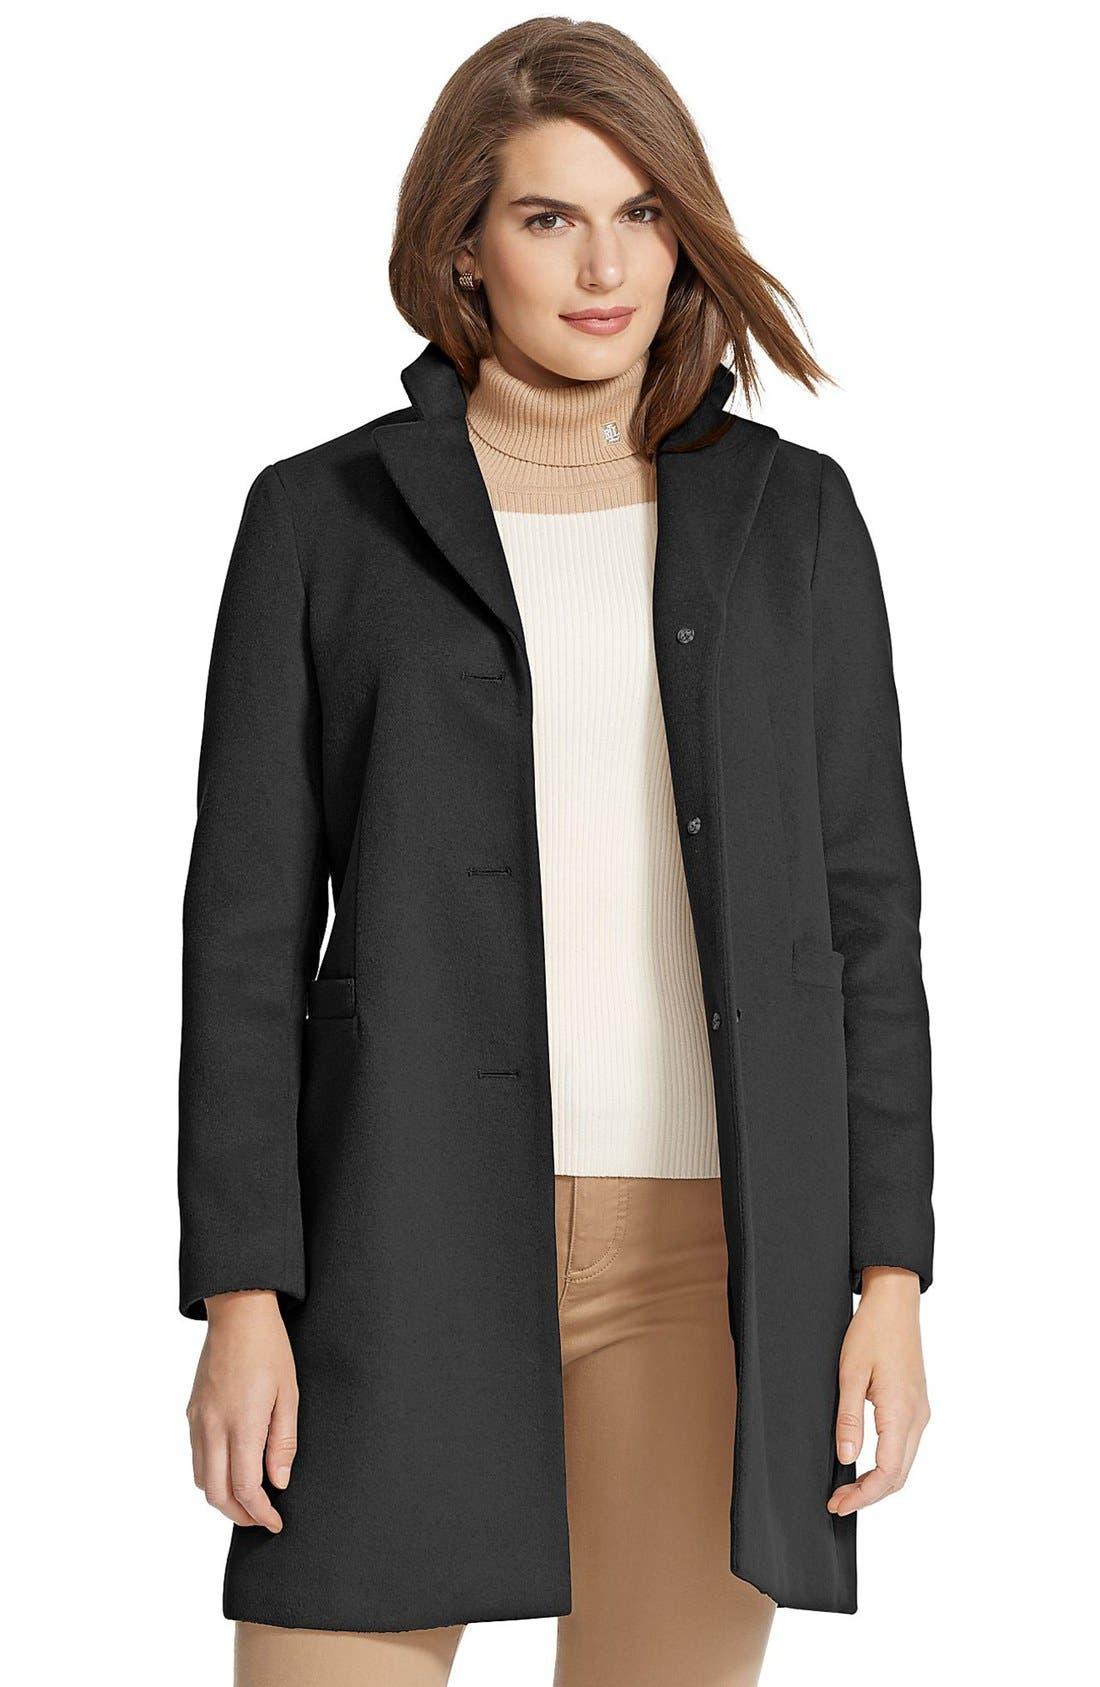 LAUREN RALPH LAUREN,                             Wool Blend Reefer Coat,                             Main thumbnail 1, color,                             BLACK